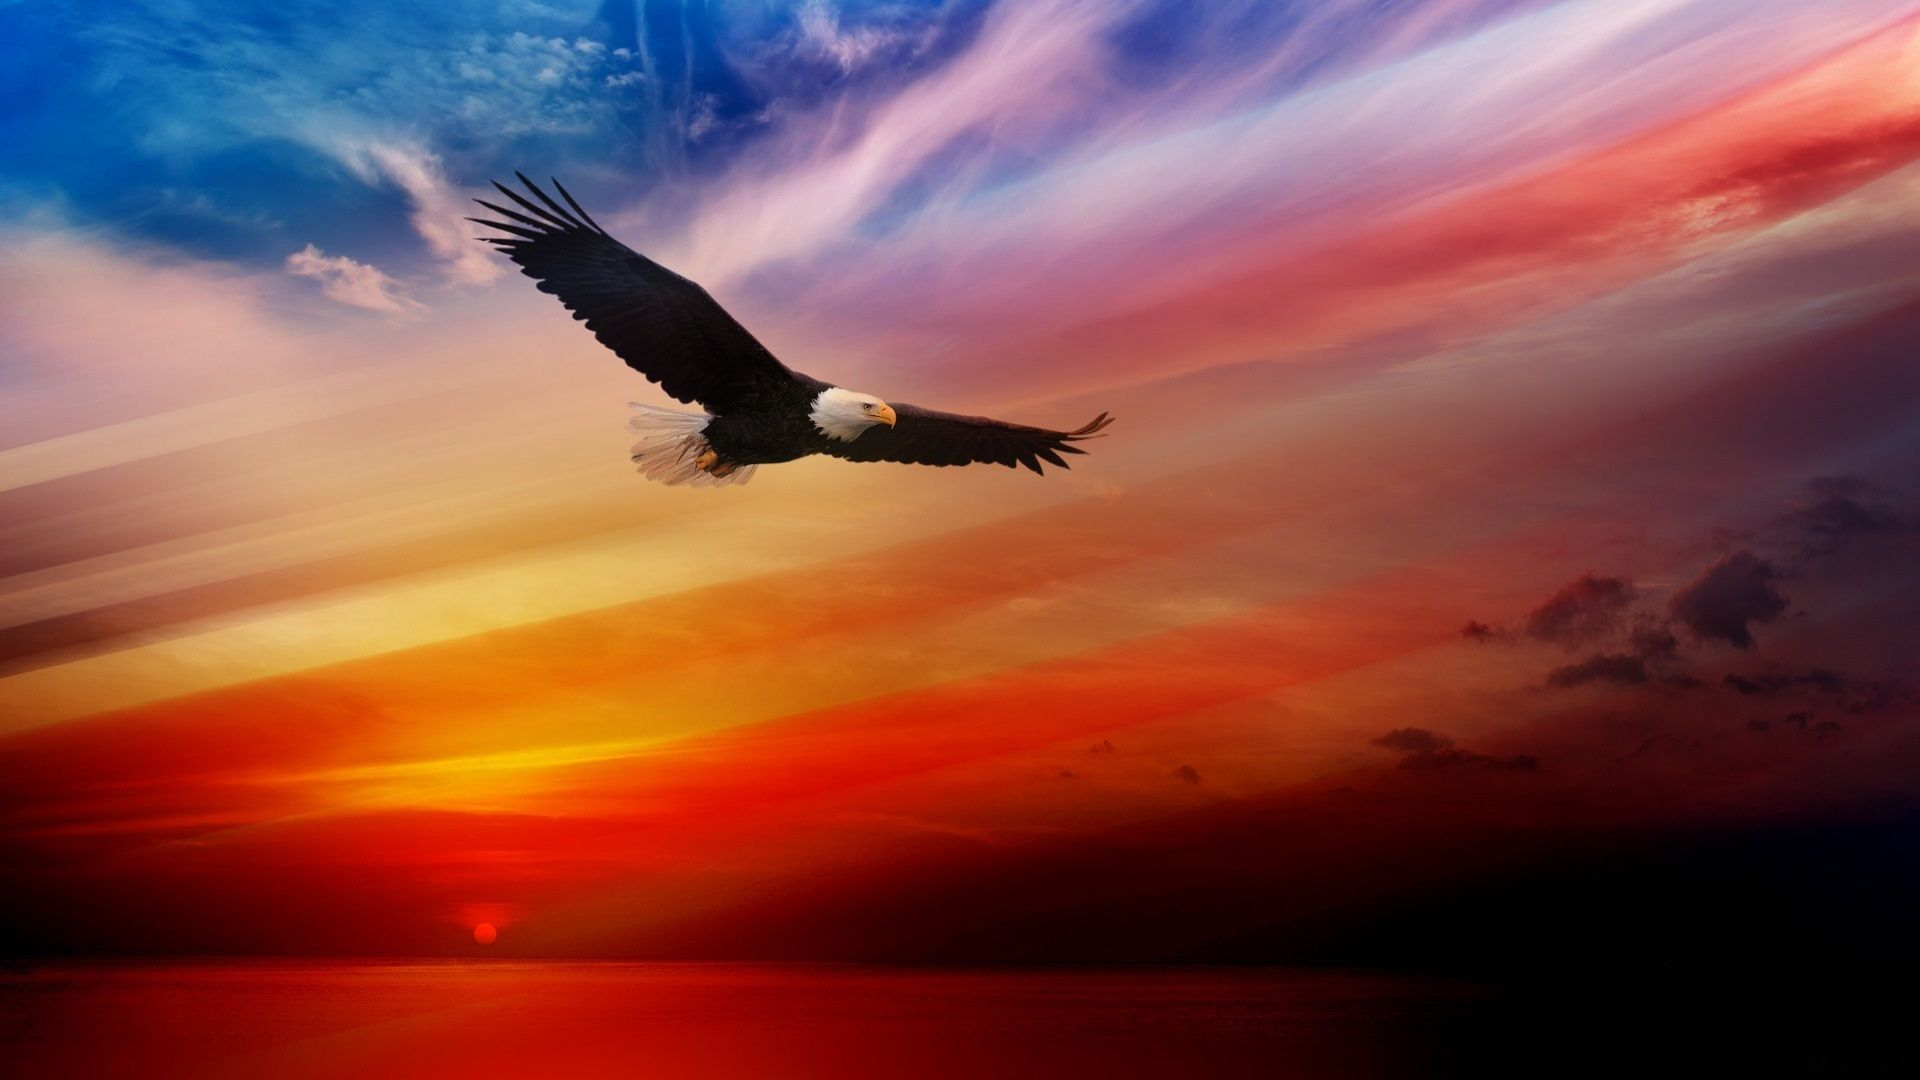 Eagle In The Sky Photos